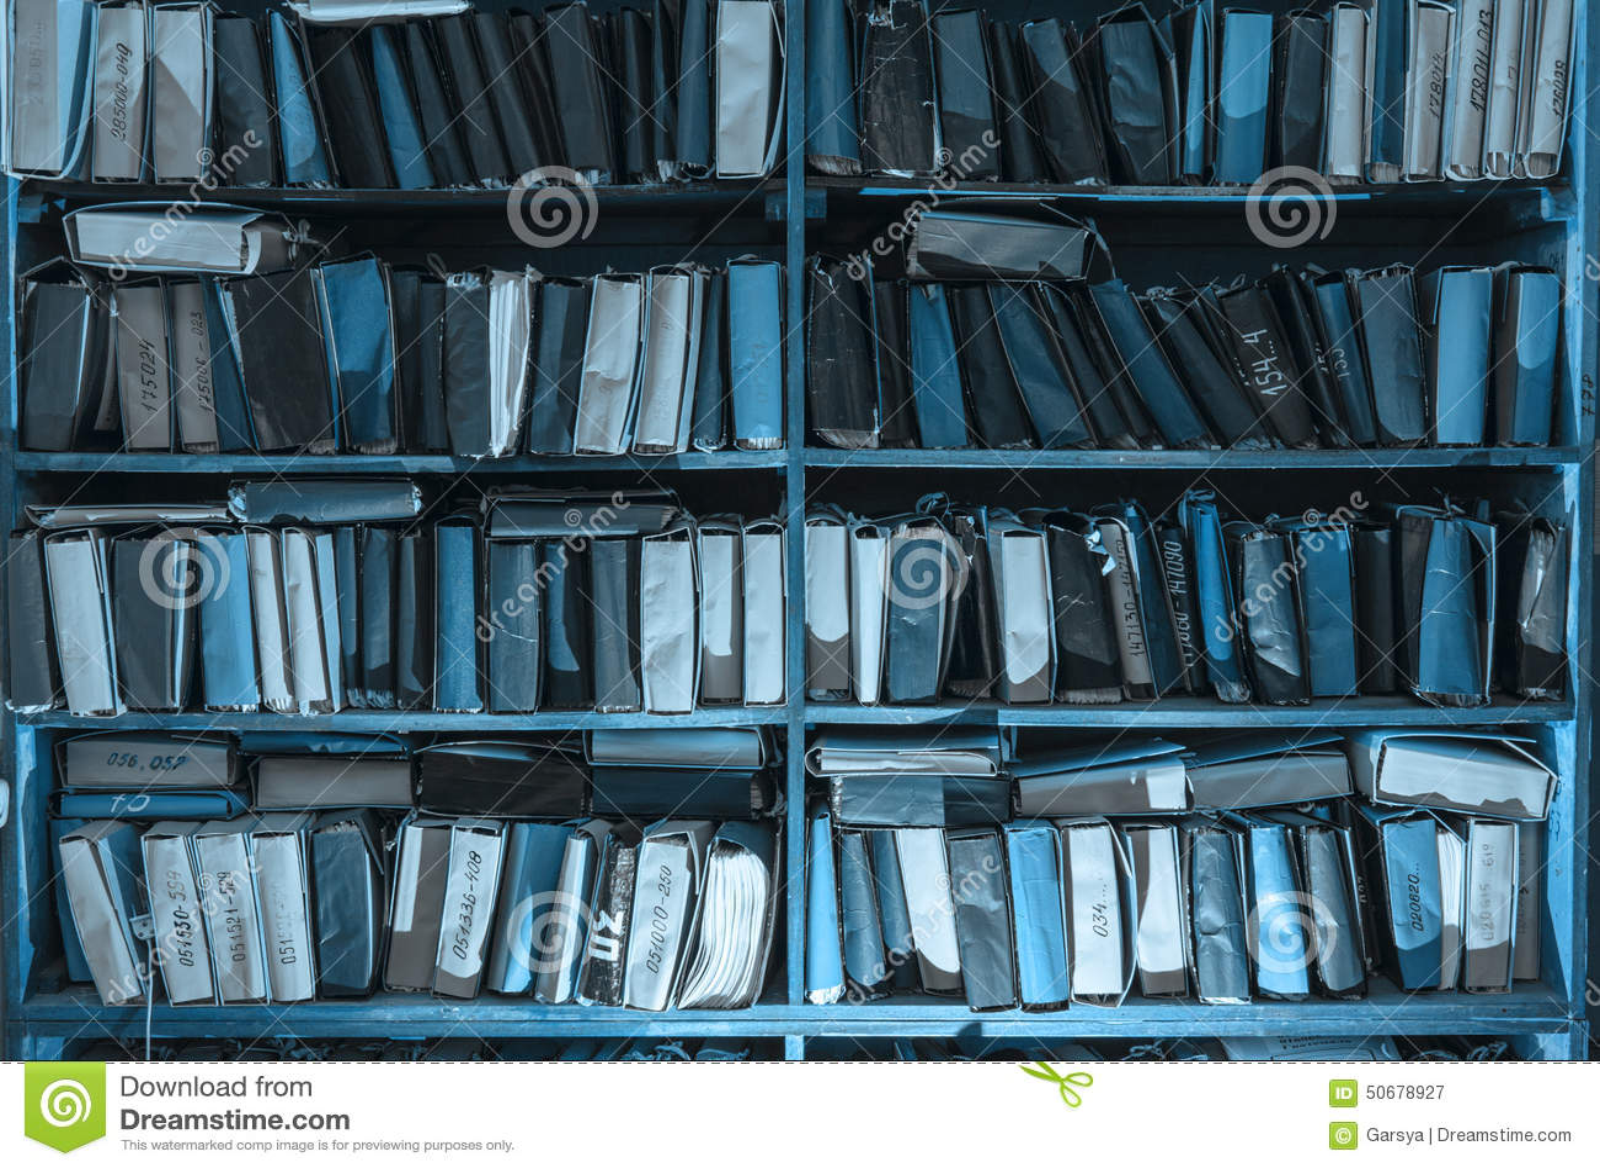 Download 在档案里堆积的纸张文件 库存图片. 图片 包括有 文件, 存贮, 办公室, 学习, 研究, 文件夹, 专门技术 - 50678927